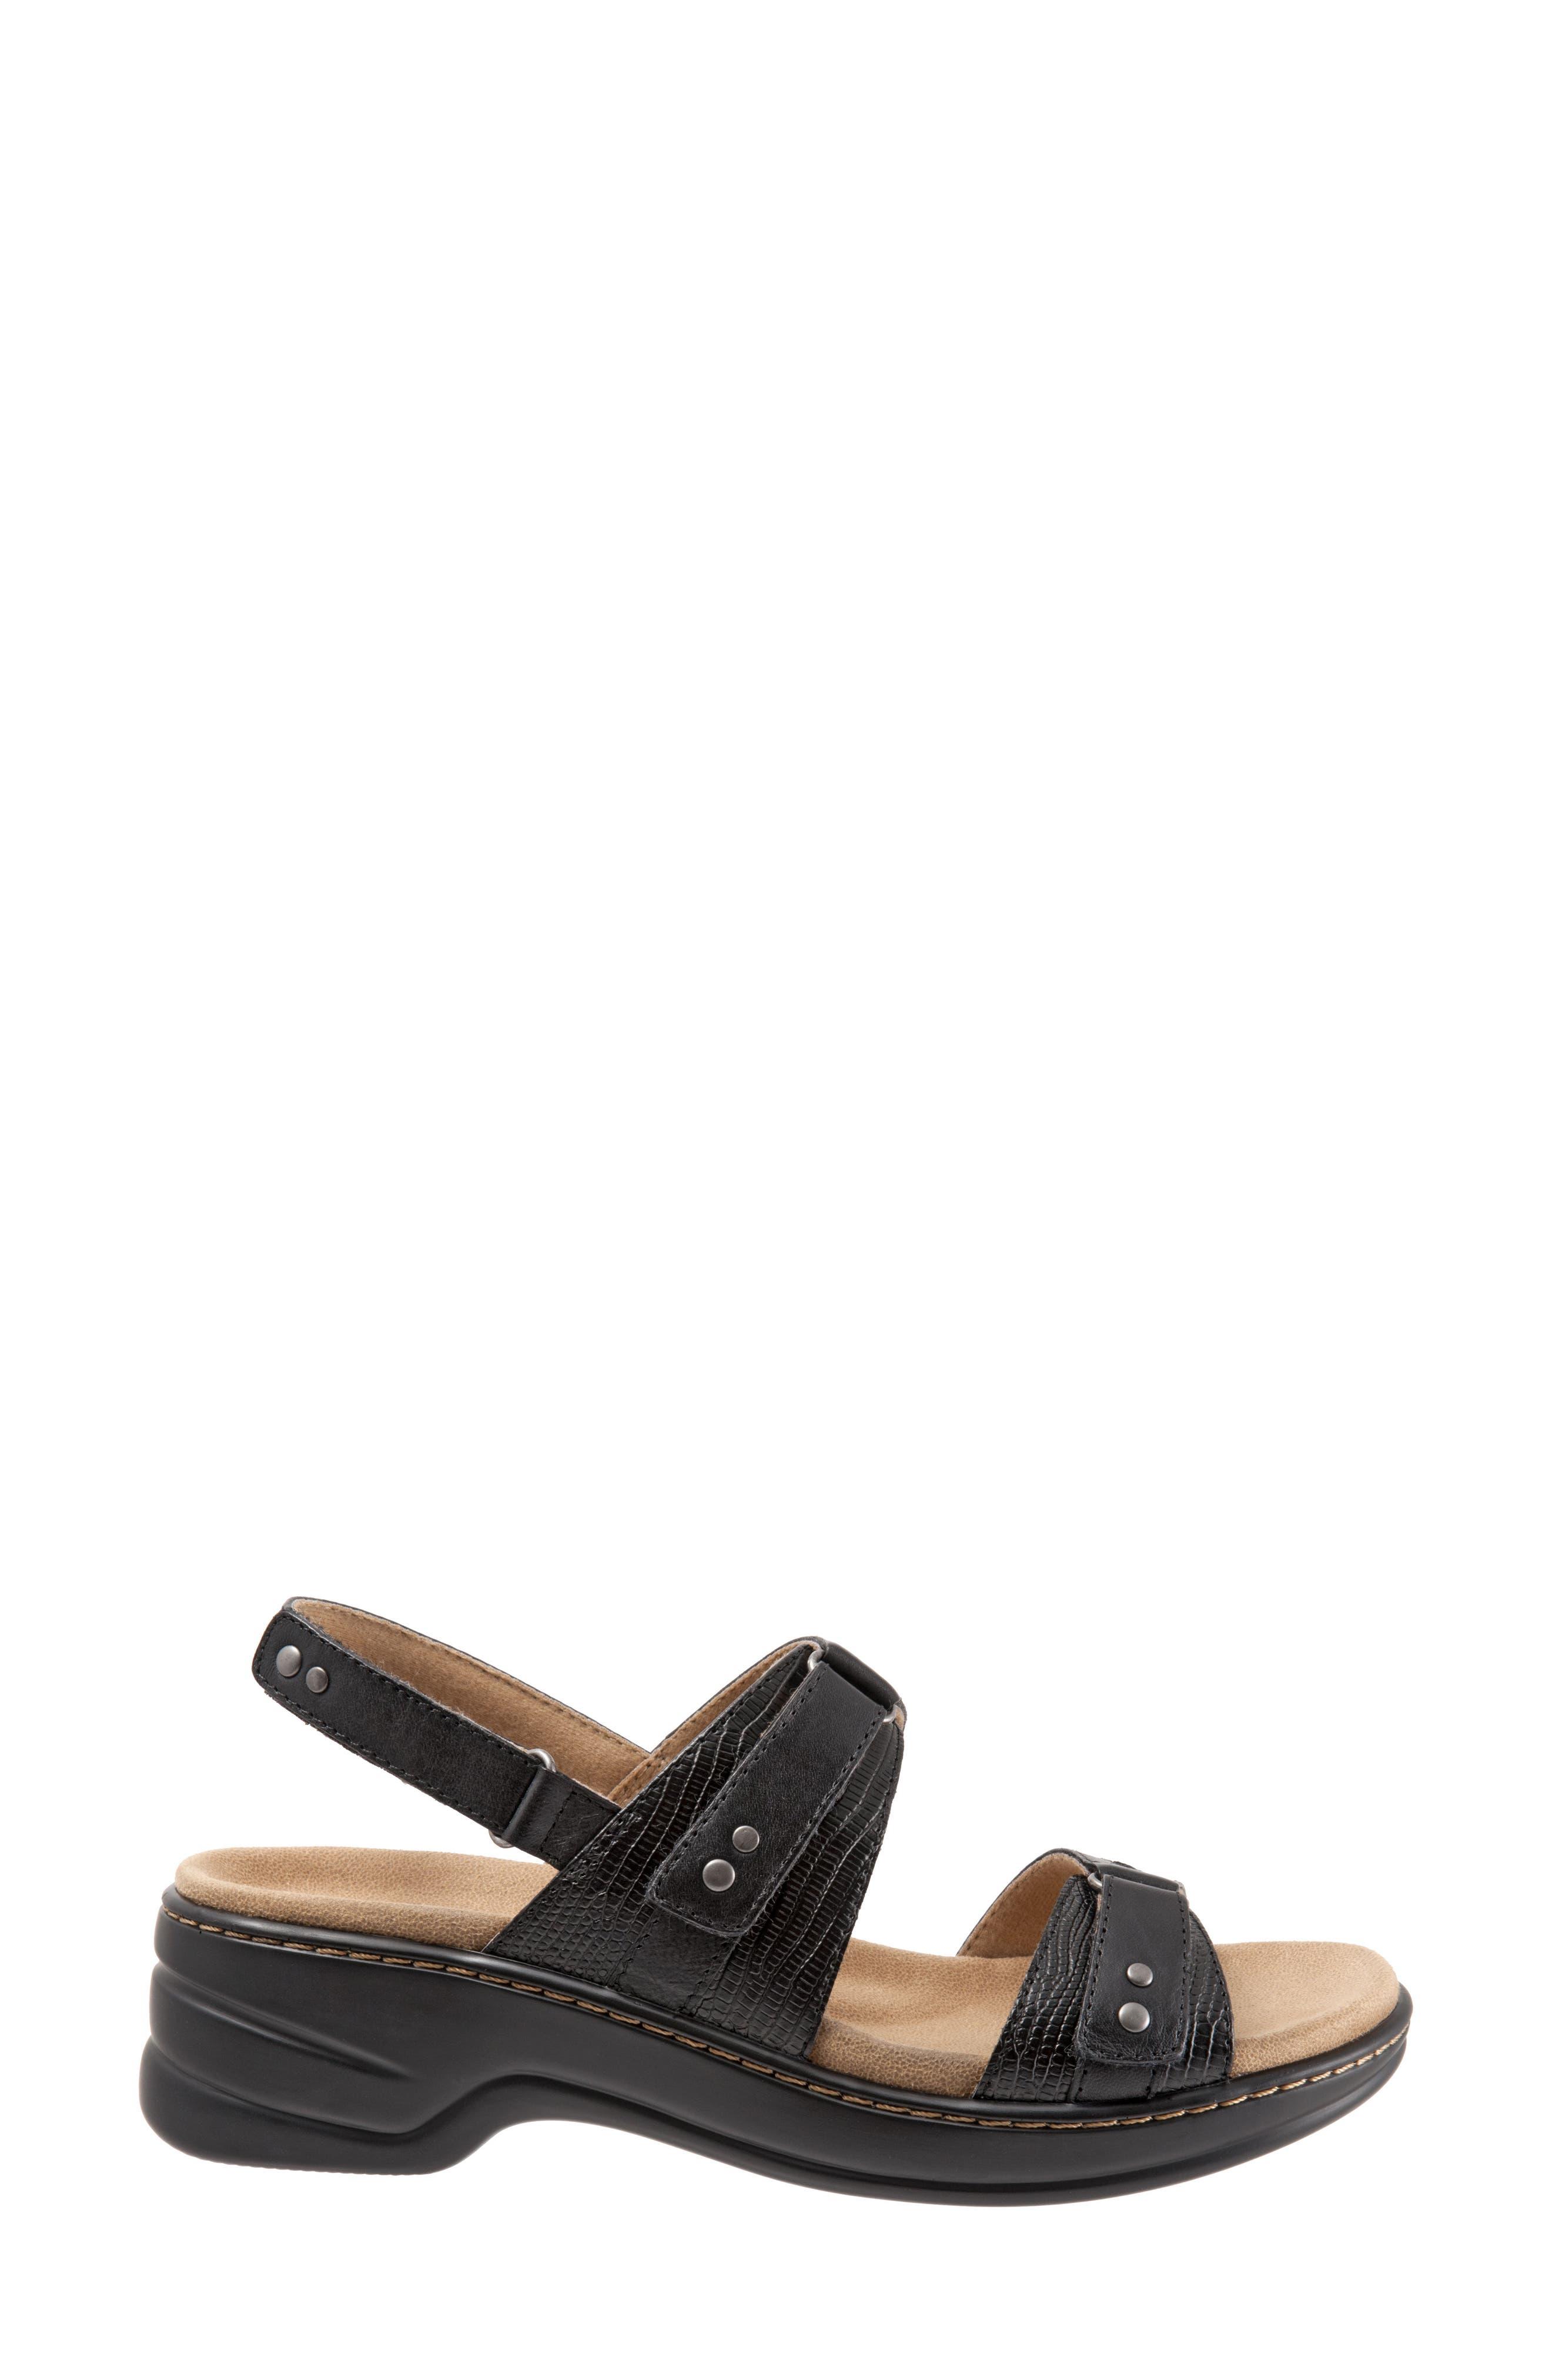 Newton Sandal,                             Alternate thumbnail 3, color,                             BLACK LEATHER